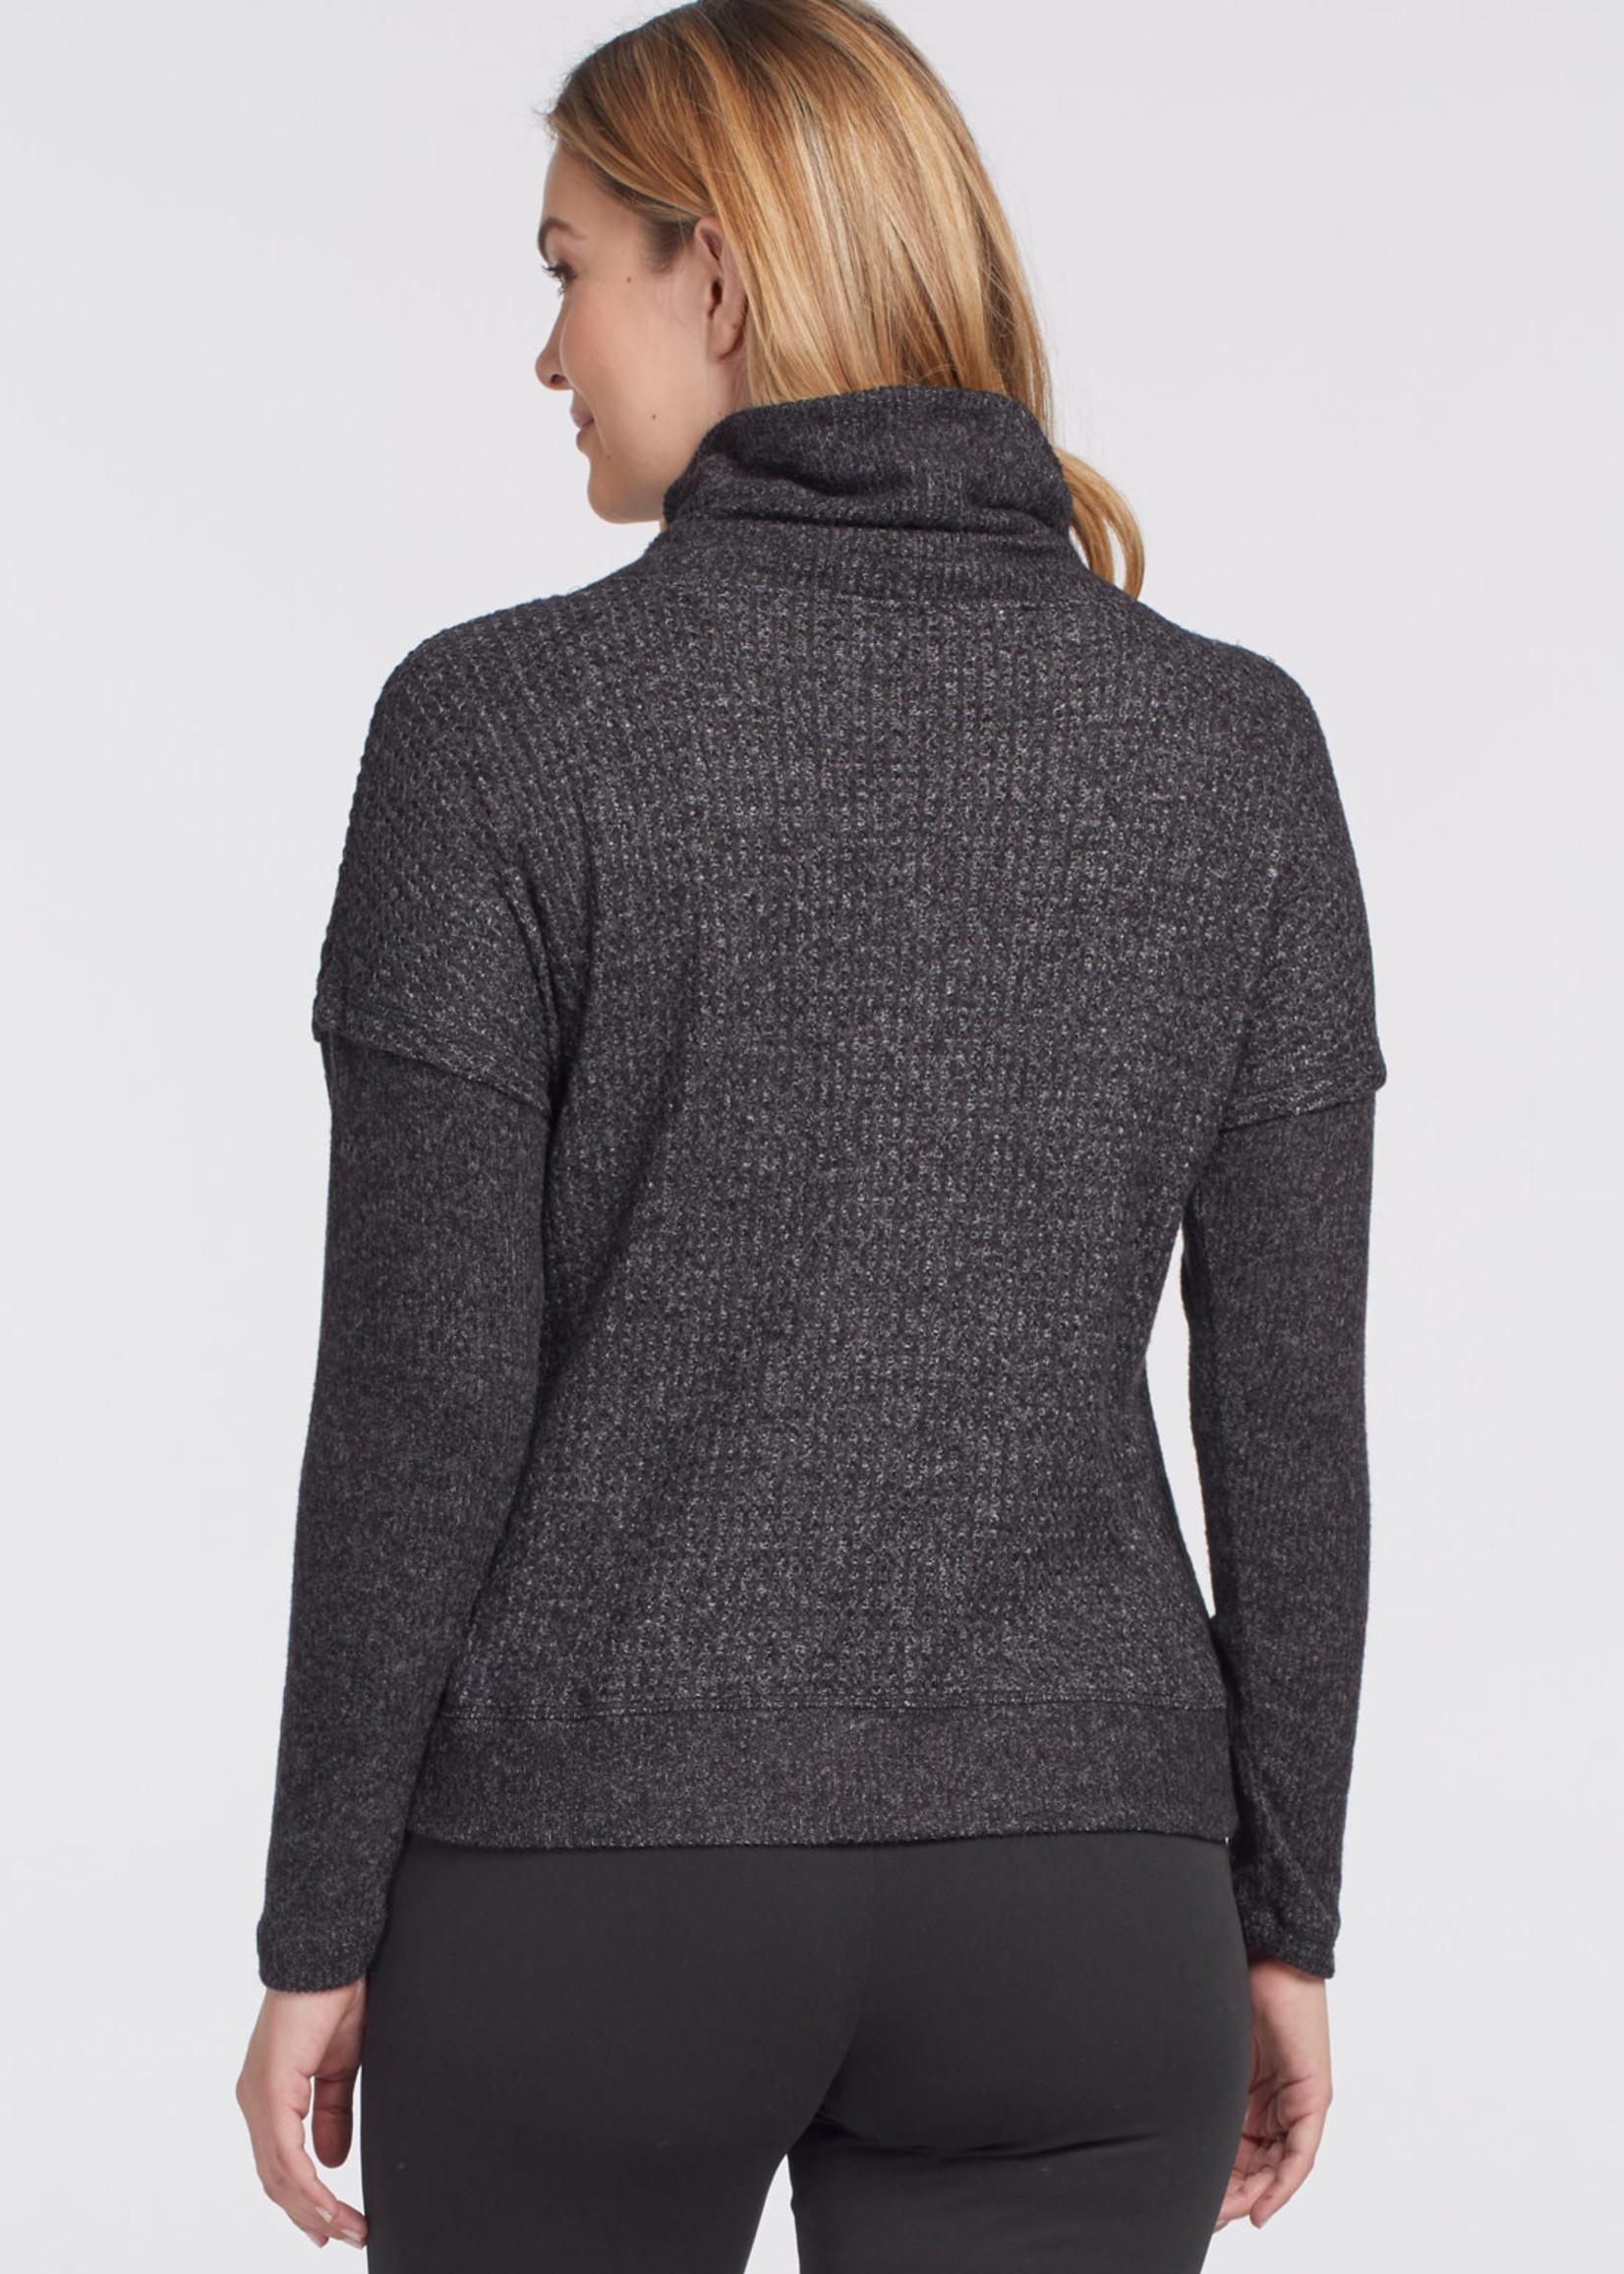 Tribal Tribal  Funnel Neck Sweater w/ Knit Details Black